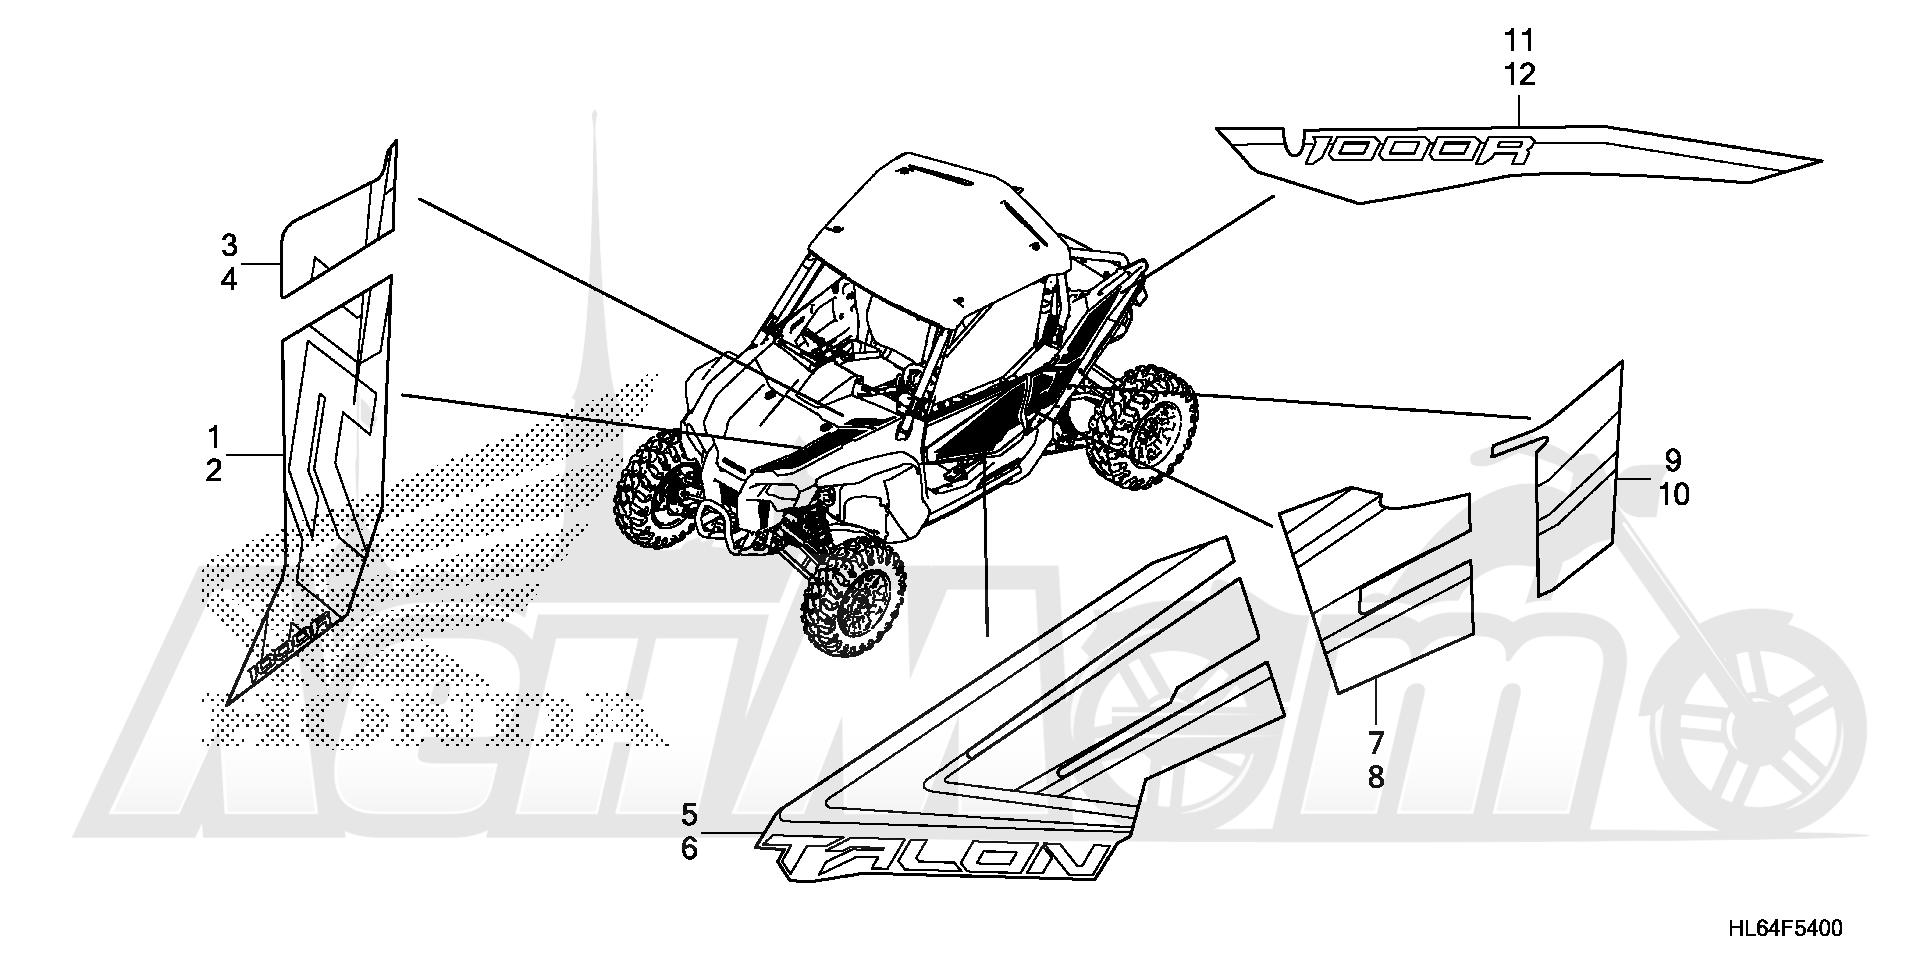 Запчасти для Квадроцикла Honda 2019 SXS1000S2R Раздел: MARK (1) | знак (1)